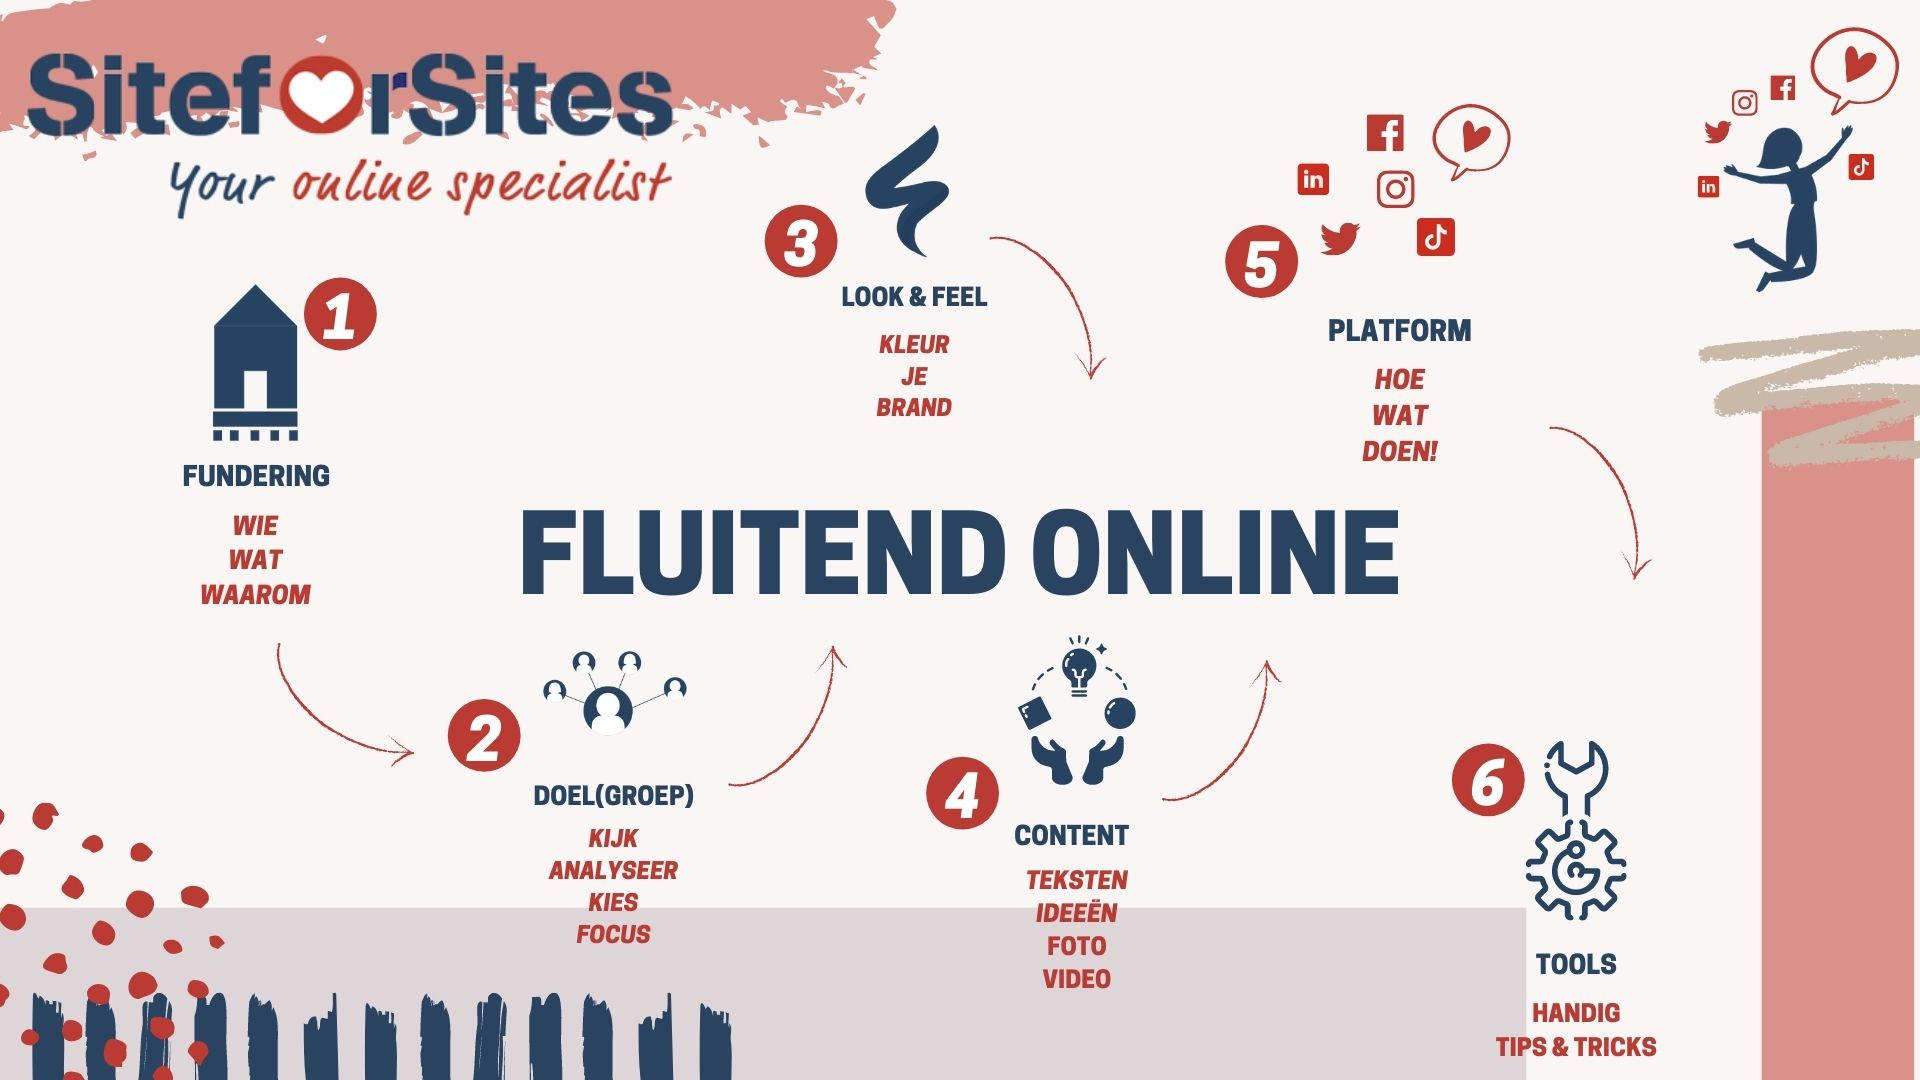 Fluitend Online